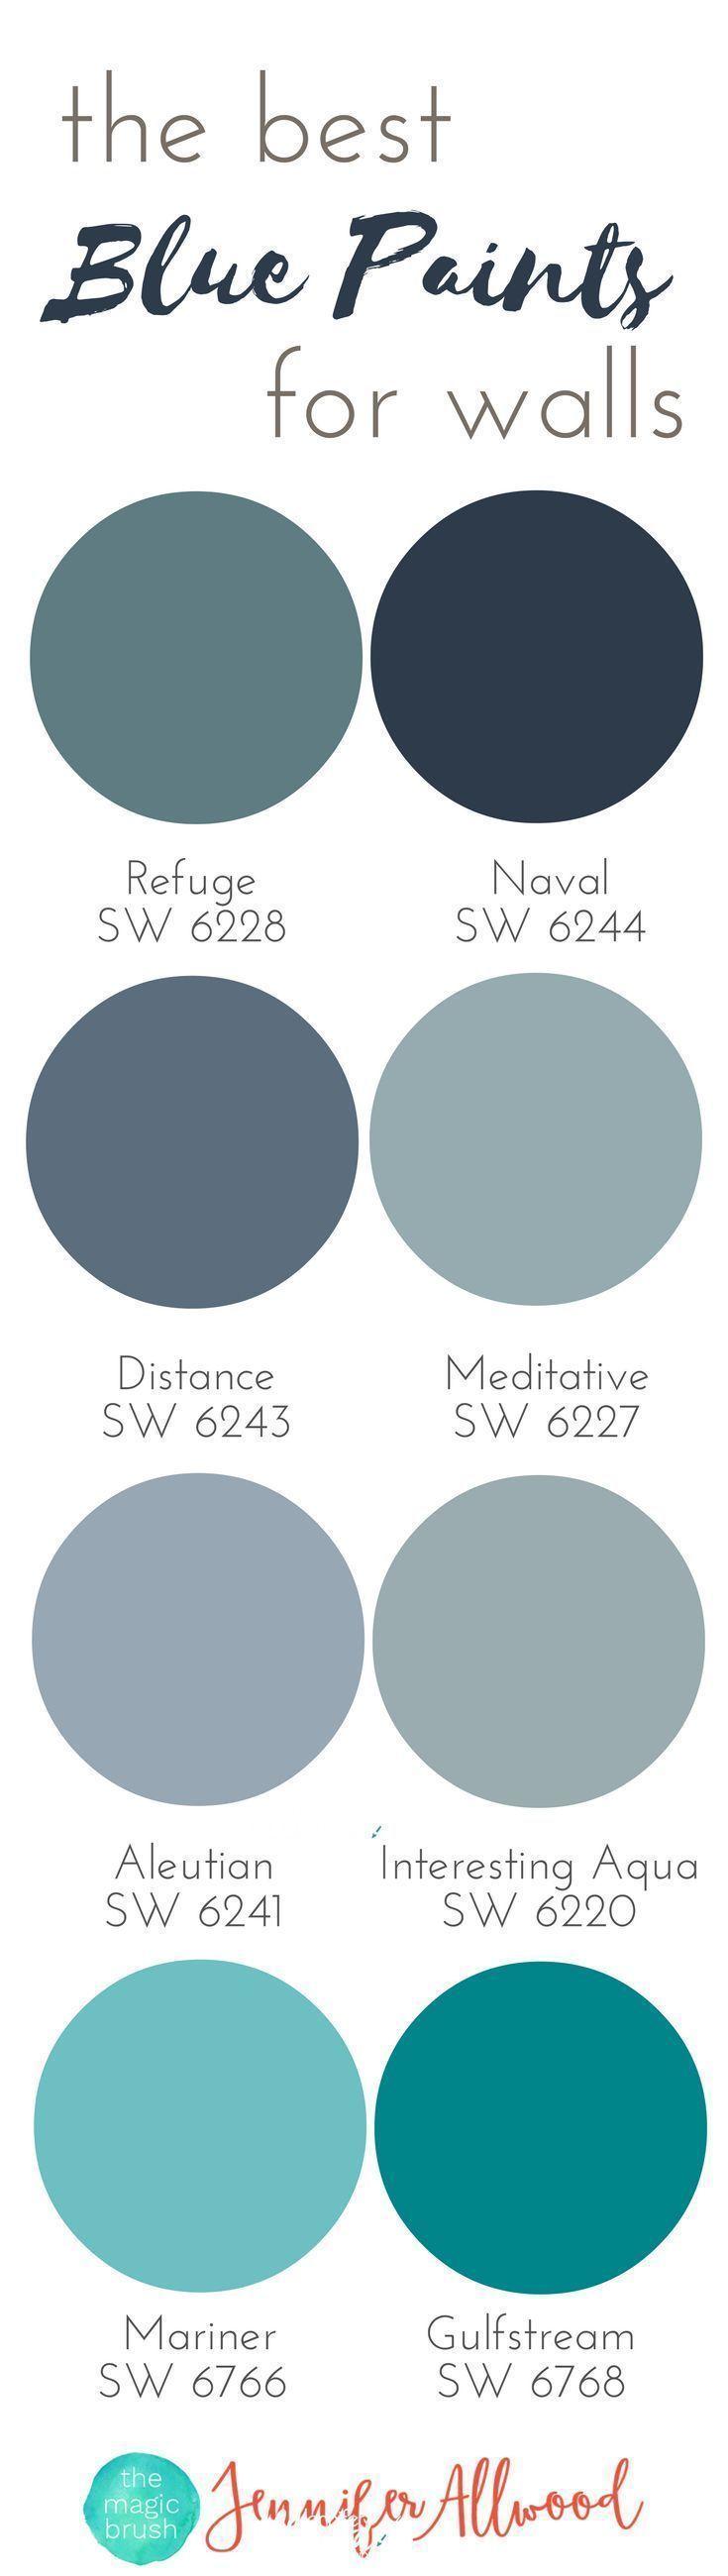 Ideas : the best Blue Paints for walls | Magic Brush | Jennifer Allwood's Top 50 Wall Paint Colors | Paint Color Ideas | Best Blue Hues | Interior Paint Colors | Paint Colors for Living Rooms | Paint Colors for Boys Rooms